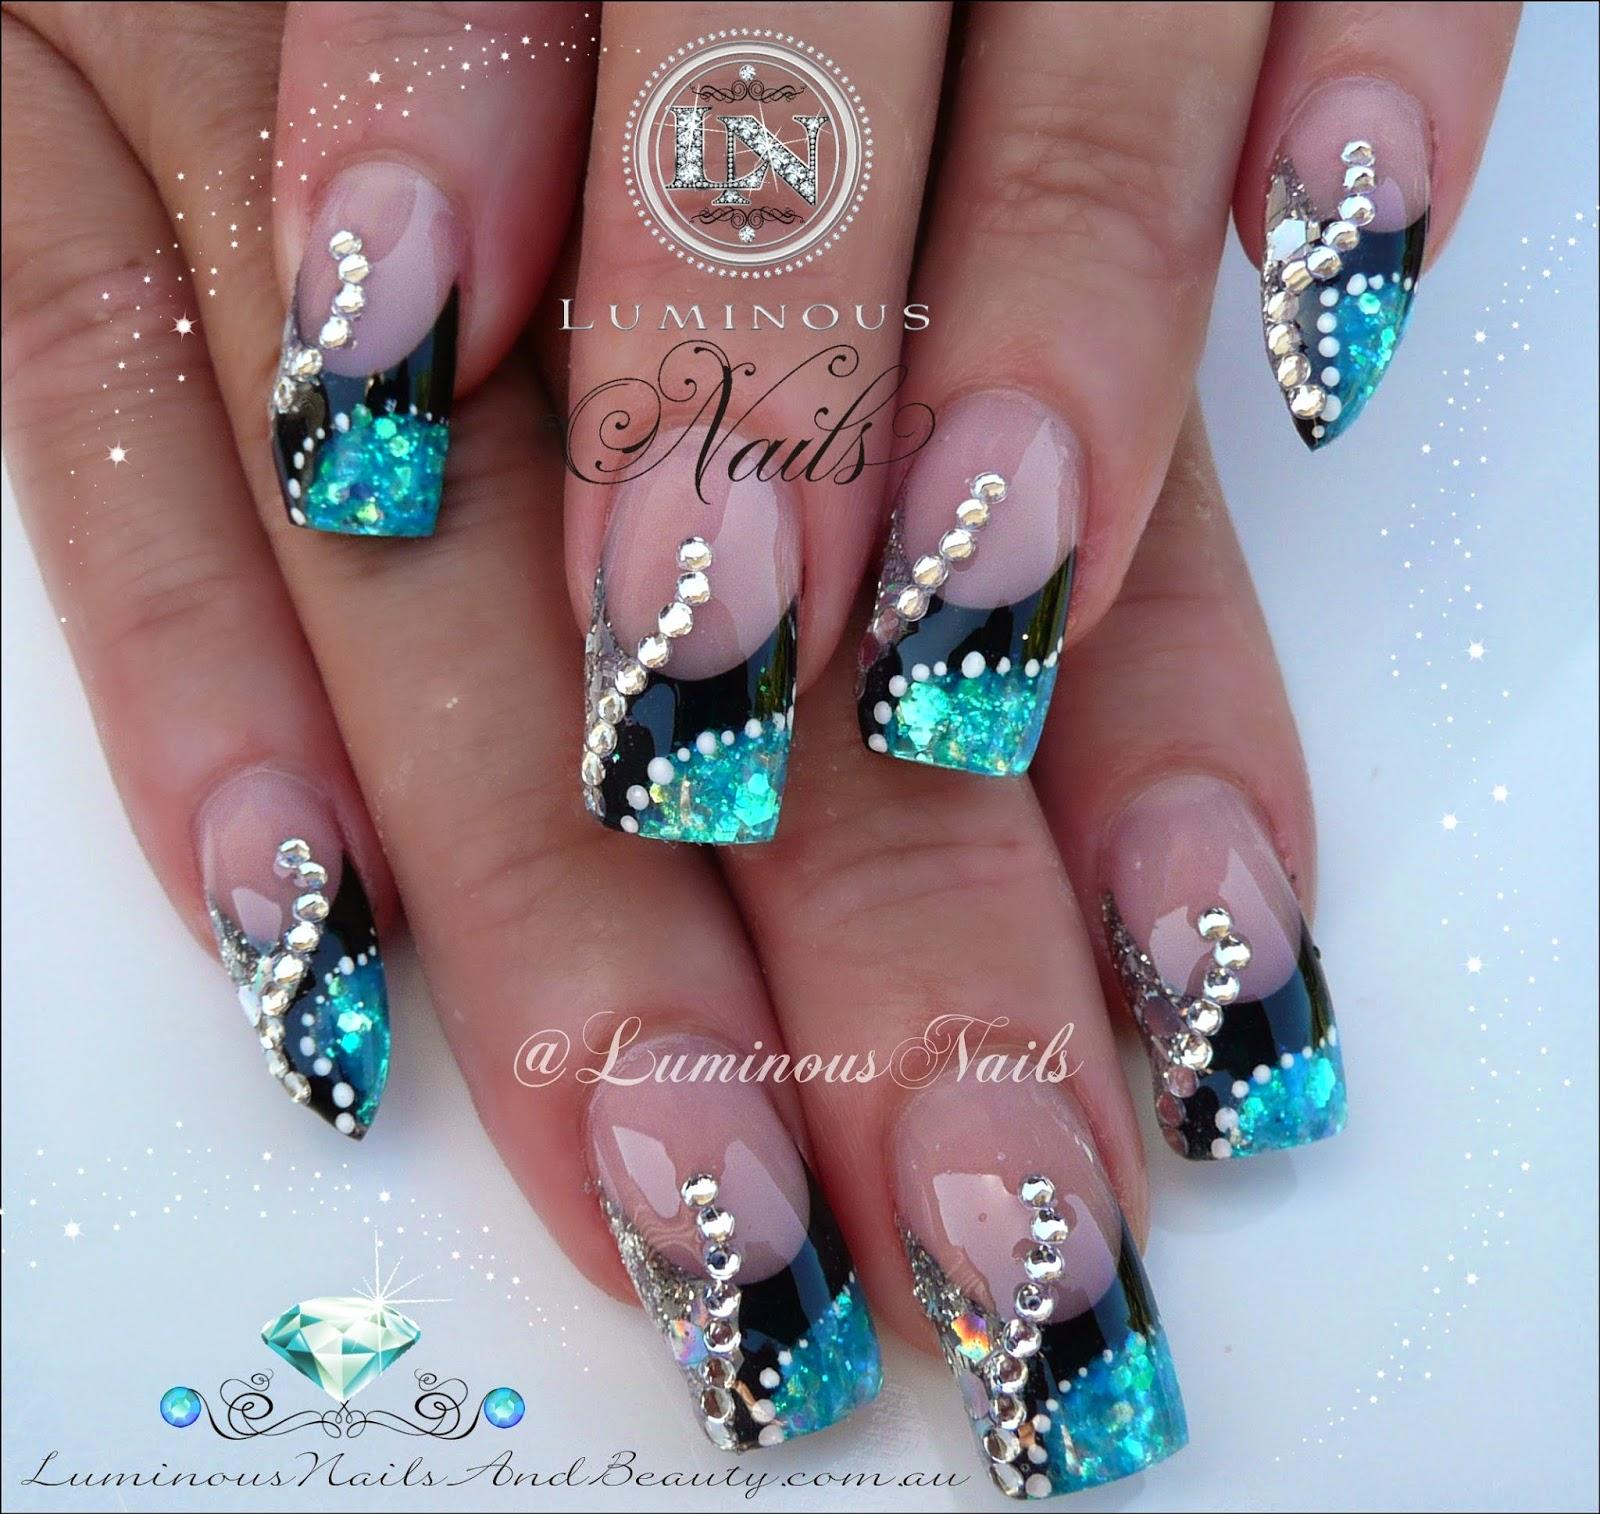 Glitter Nail Art Designs: Luminous Nails: April 2014